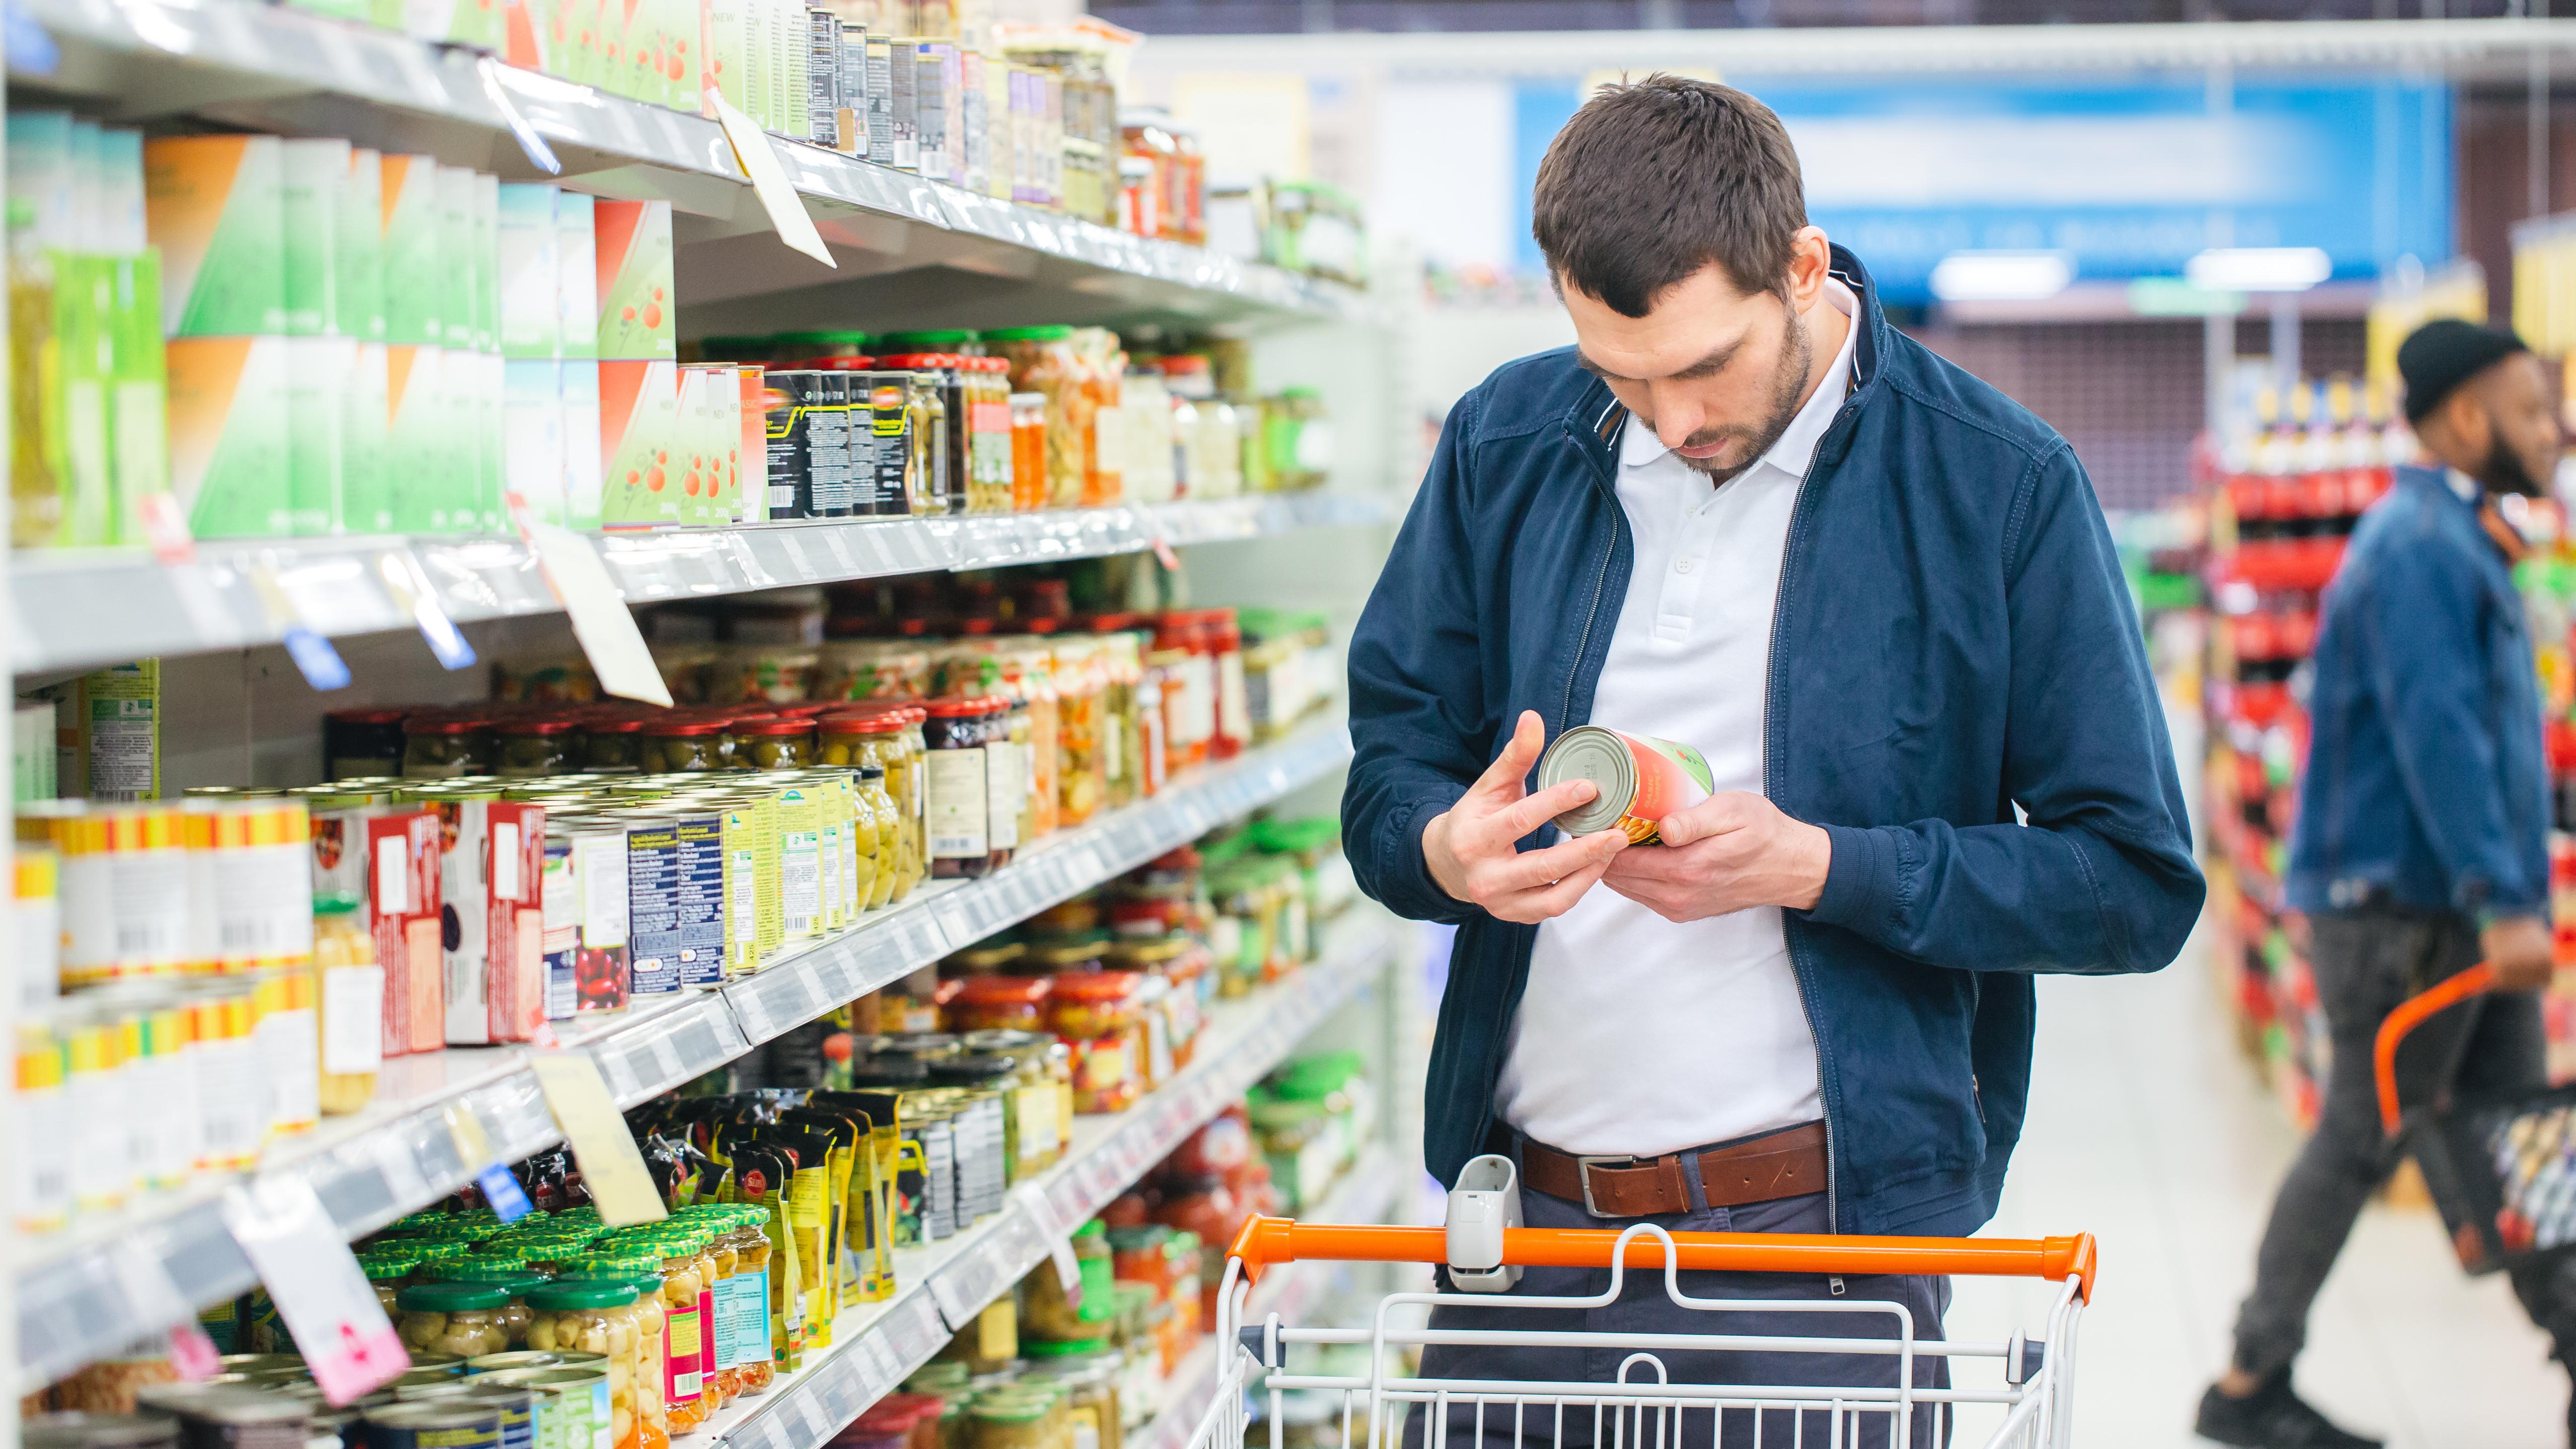 At the Supermarket: Handsome Man Uses Sm